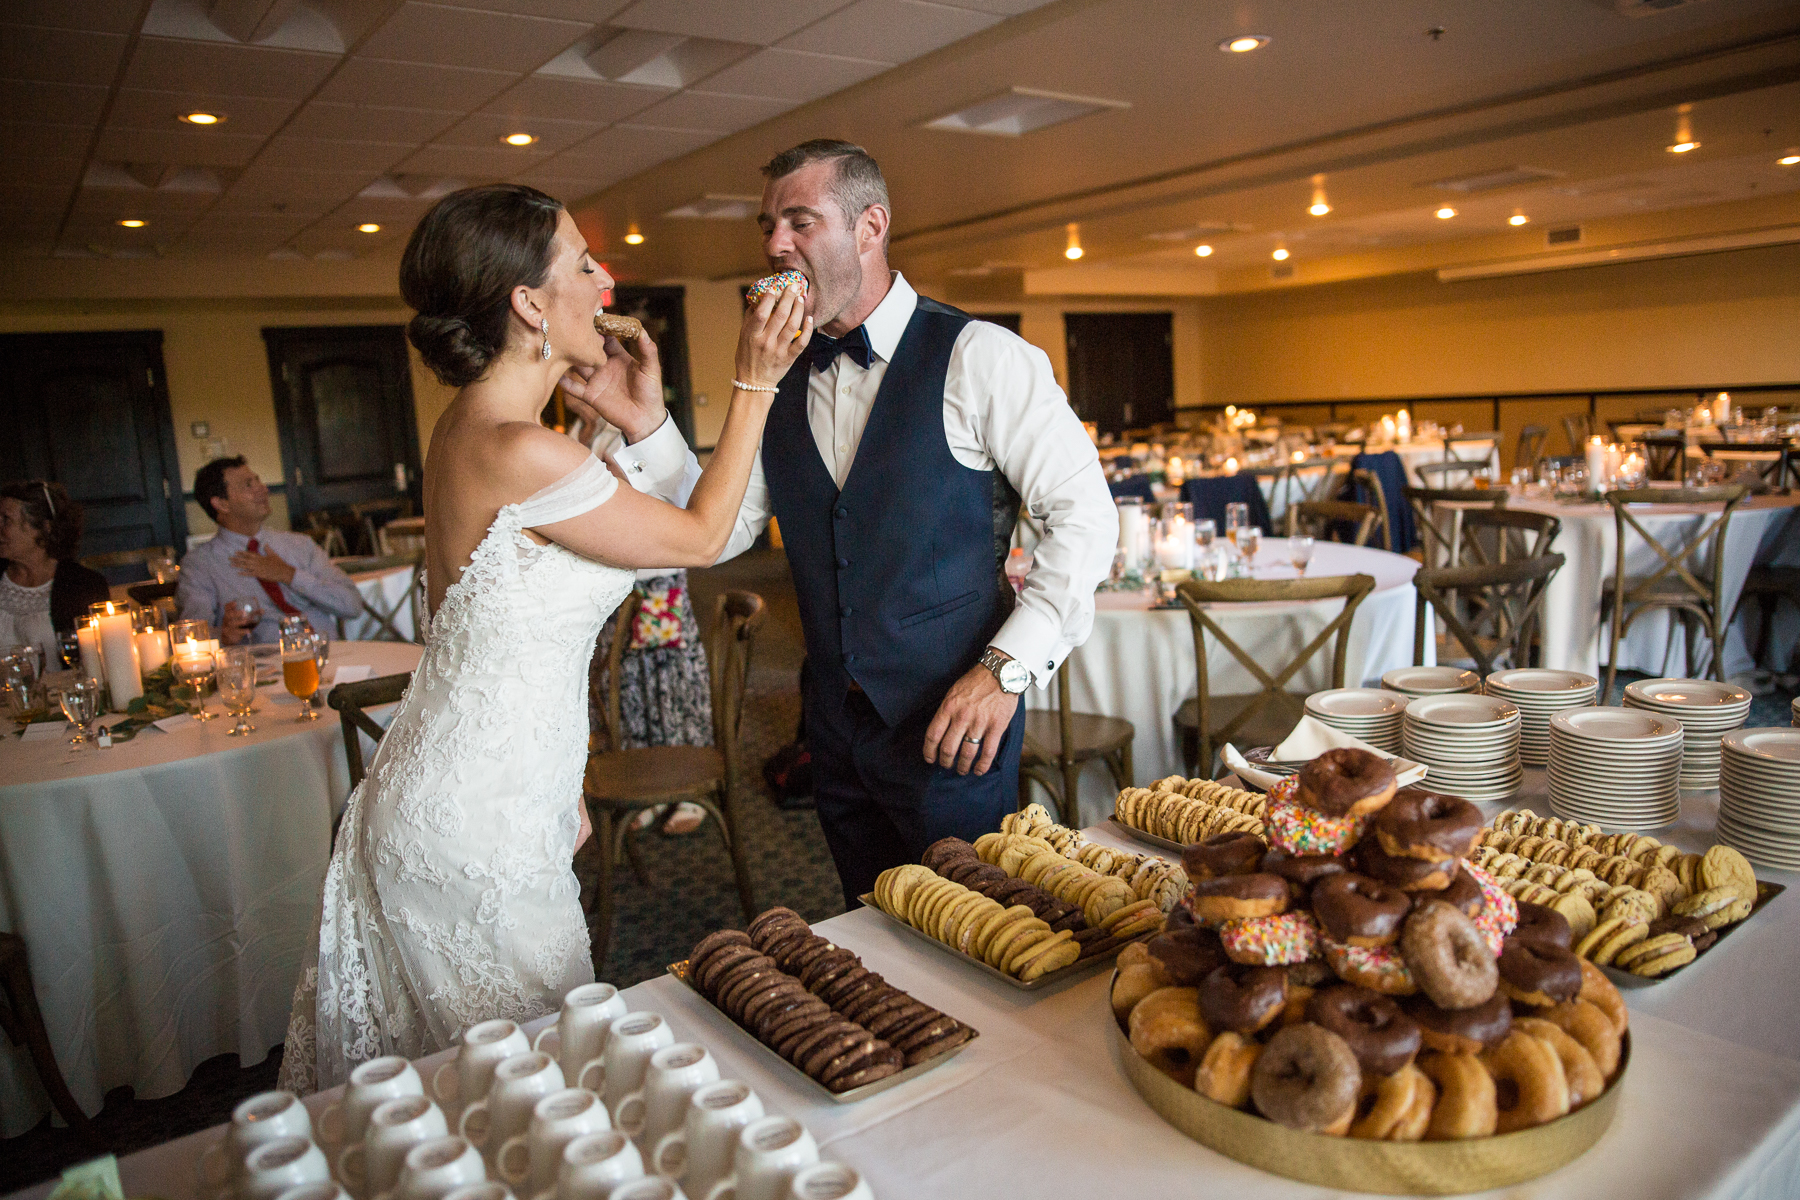 StaciDesign-Colorado-Wedding-5770.jpg